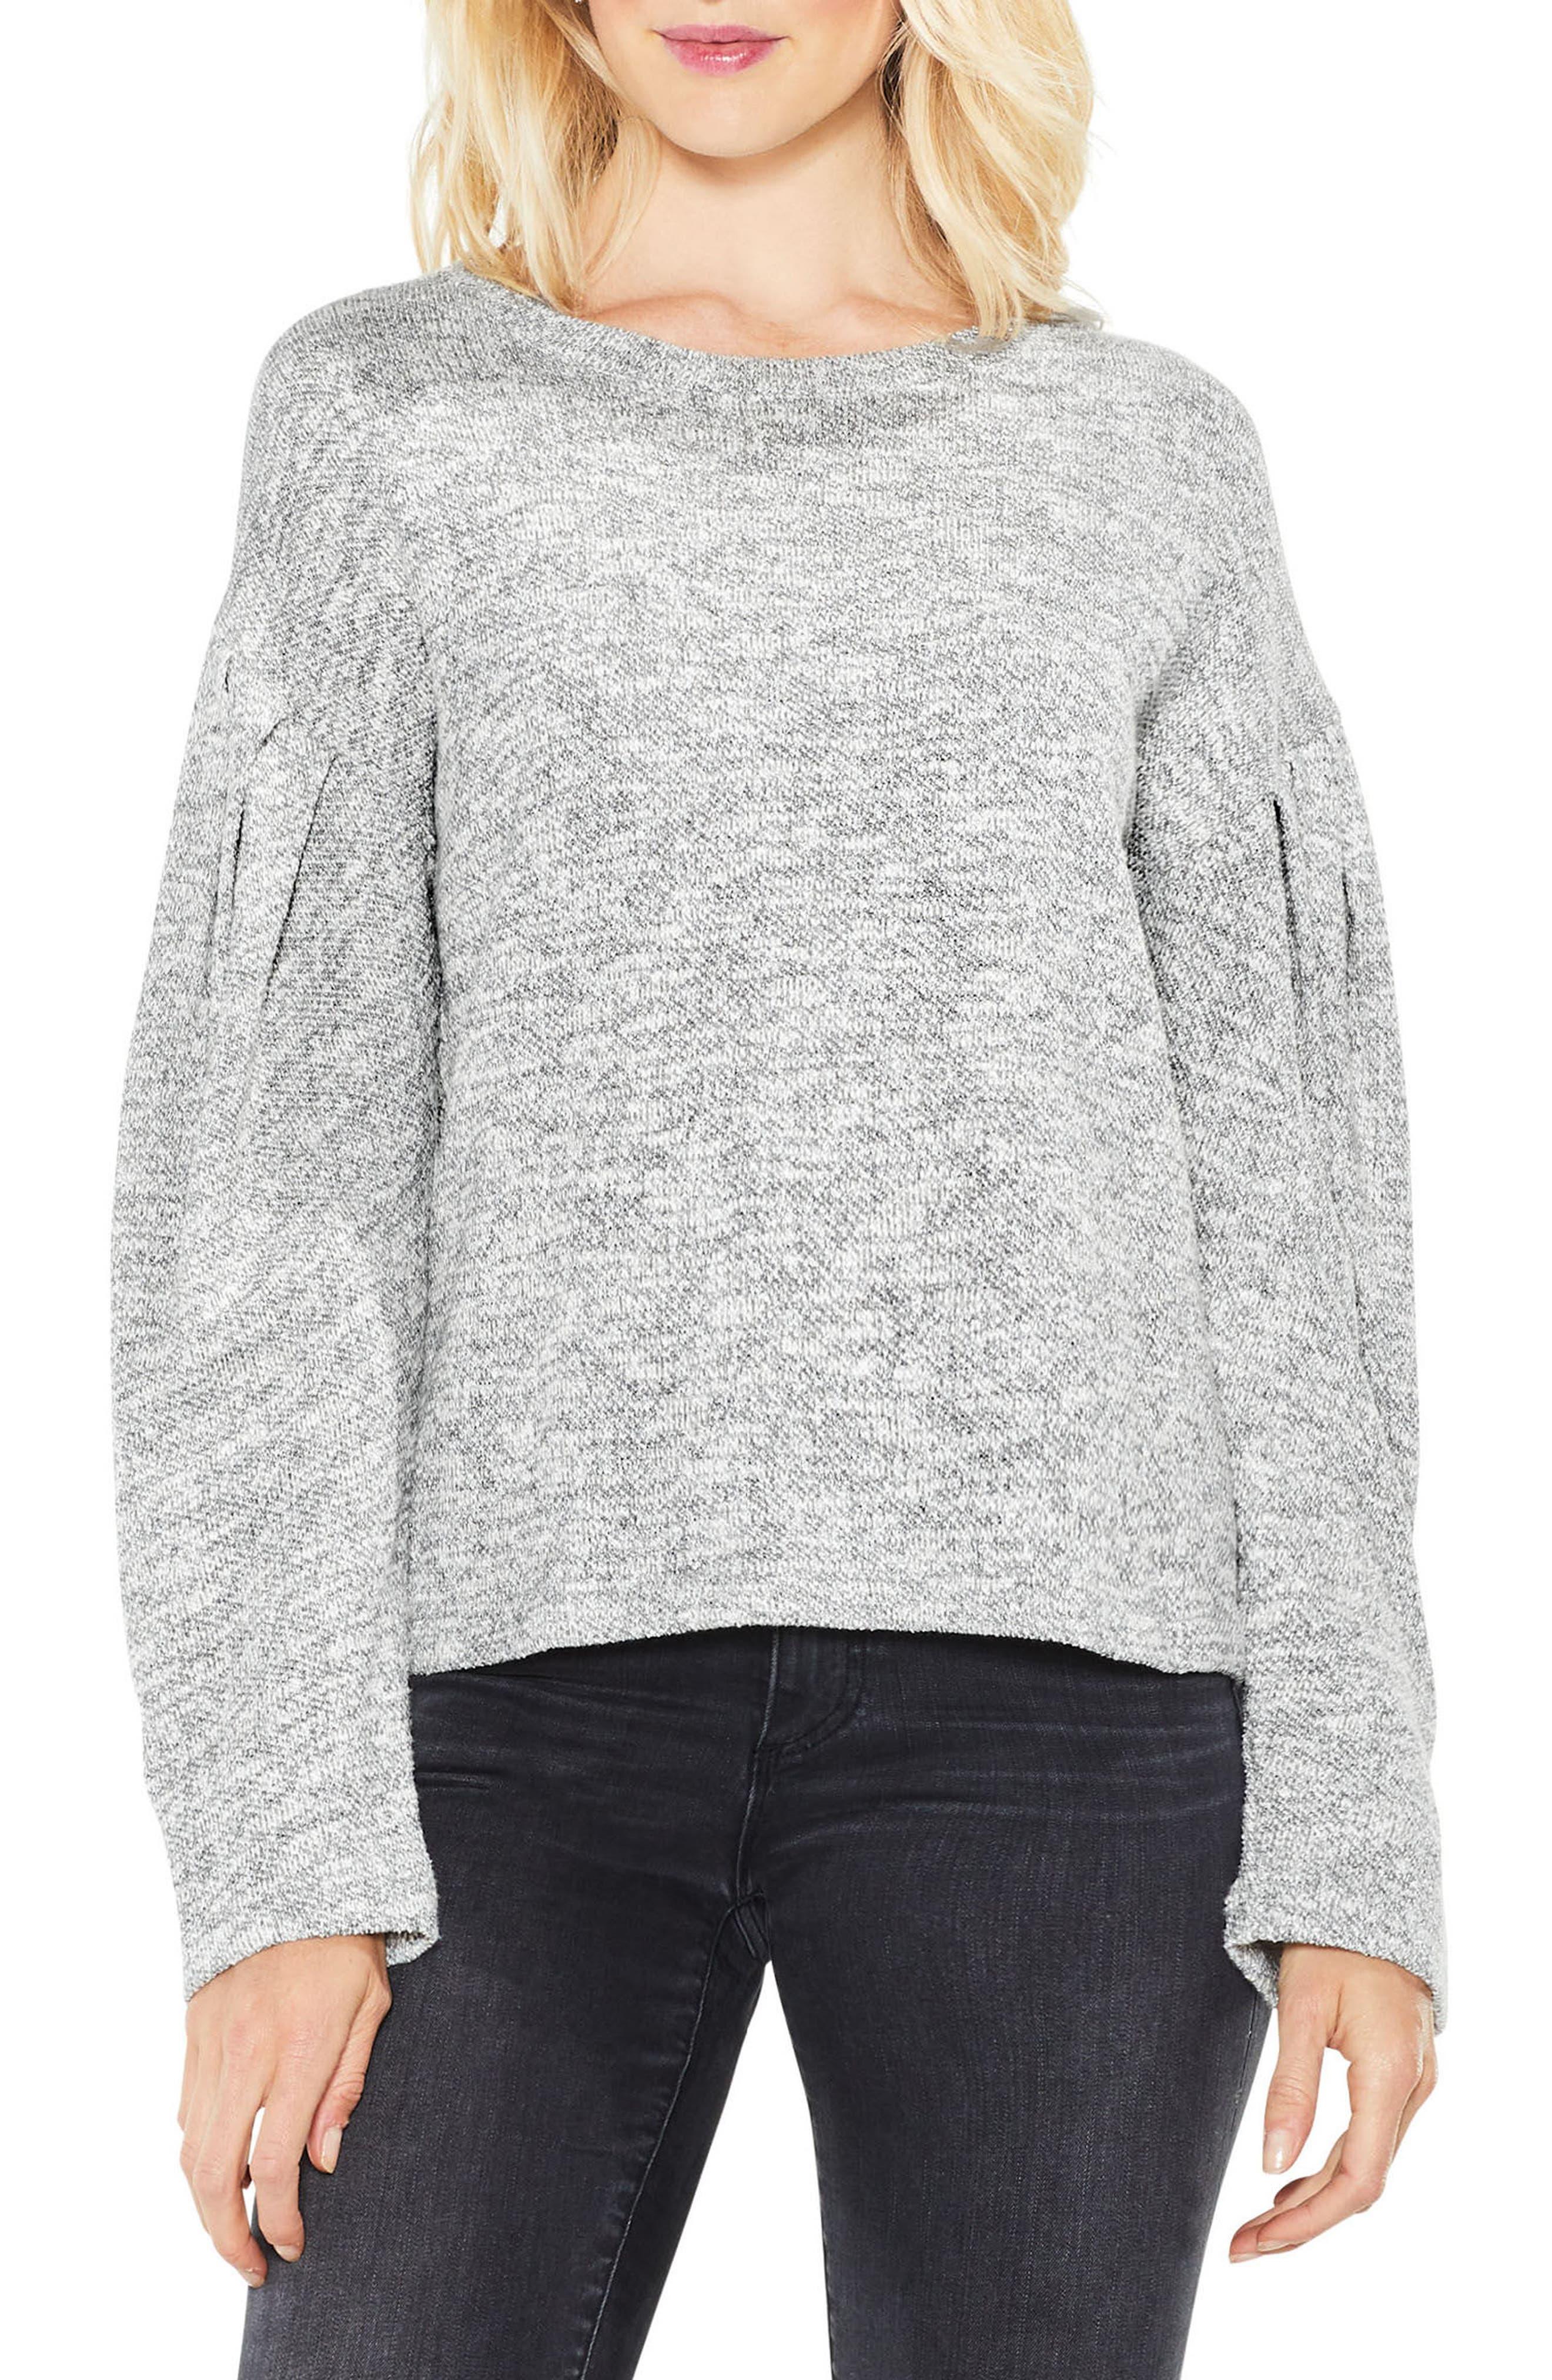 Metallic Knit Sweater,                             Main thumbnail 1, color,                             Grey Heather